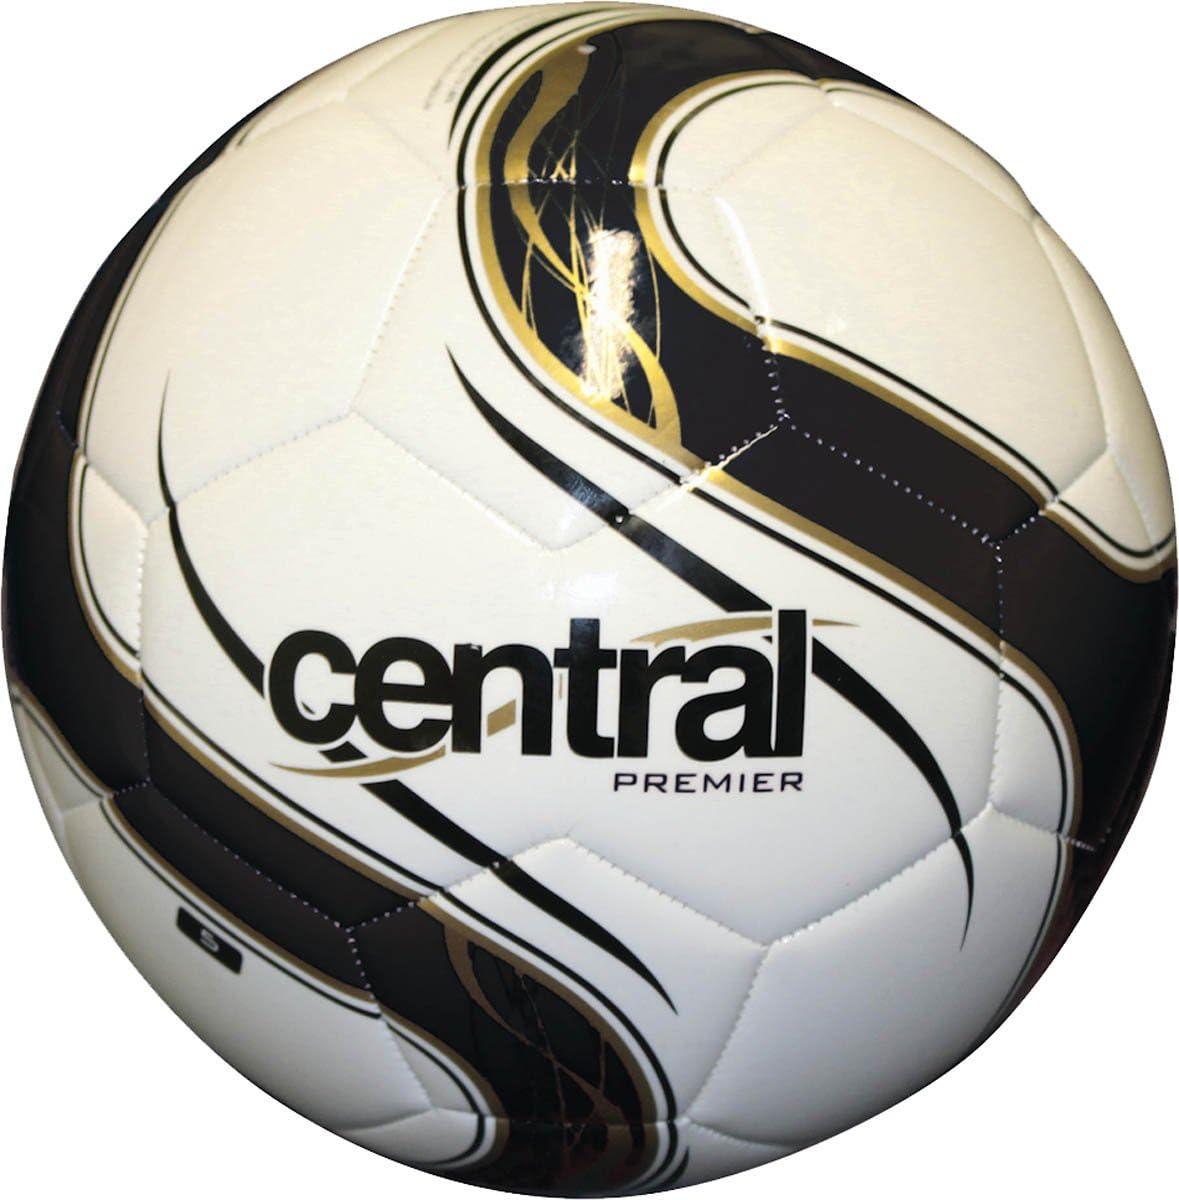 Central Balón de fútbol de Entrenamiento con Forro Interior Fuerte ...